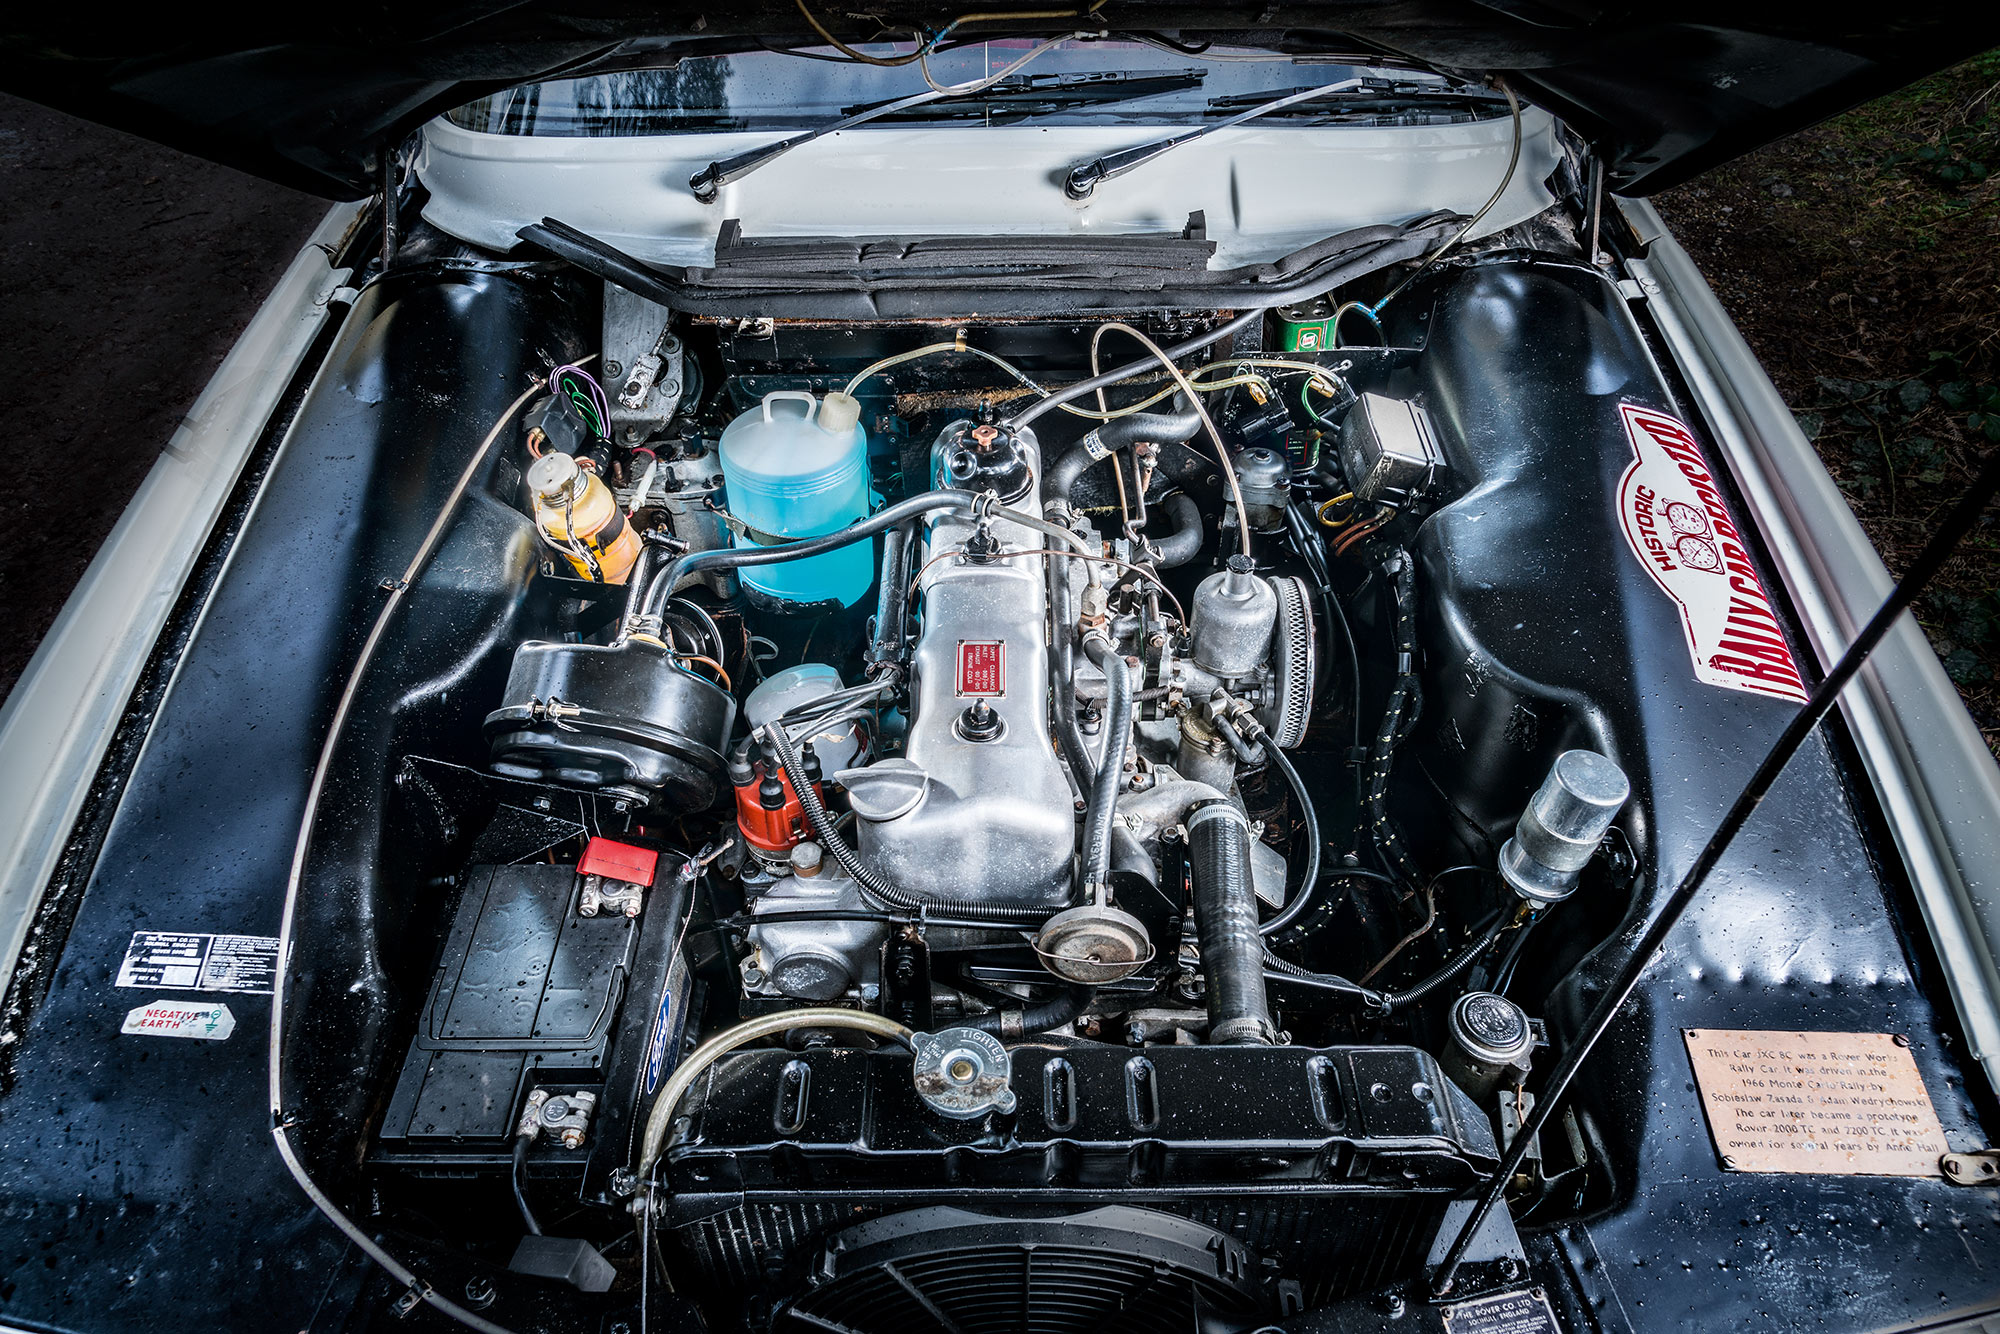 #47, Rover, Rallye Monte Carlo, 2000TC, P6